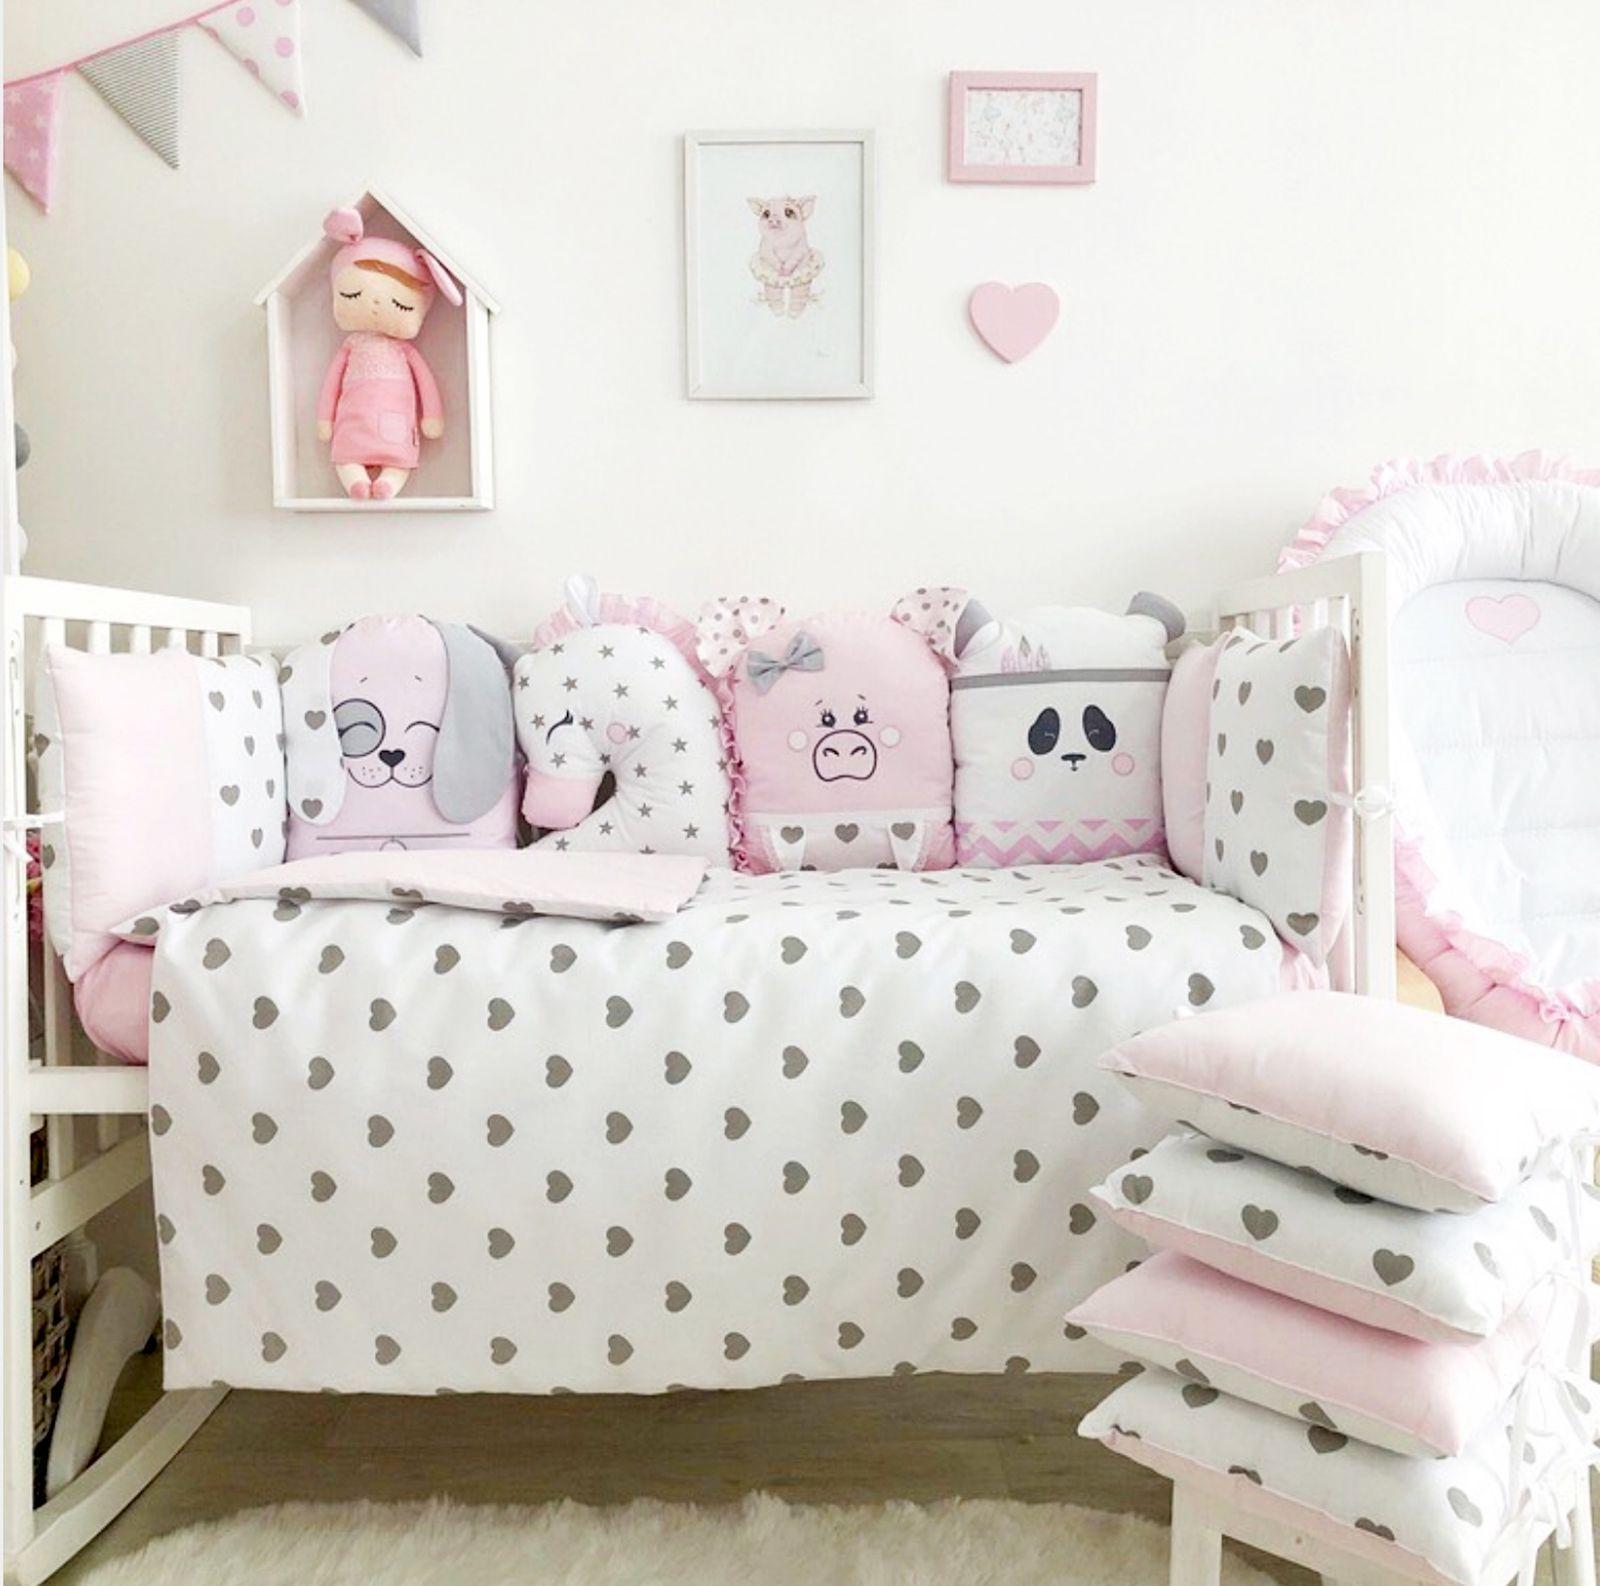 Crib Set For Girl Girl Crib Bedding Set Crib Bumper Pad Crib